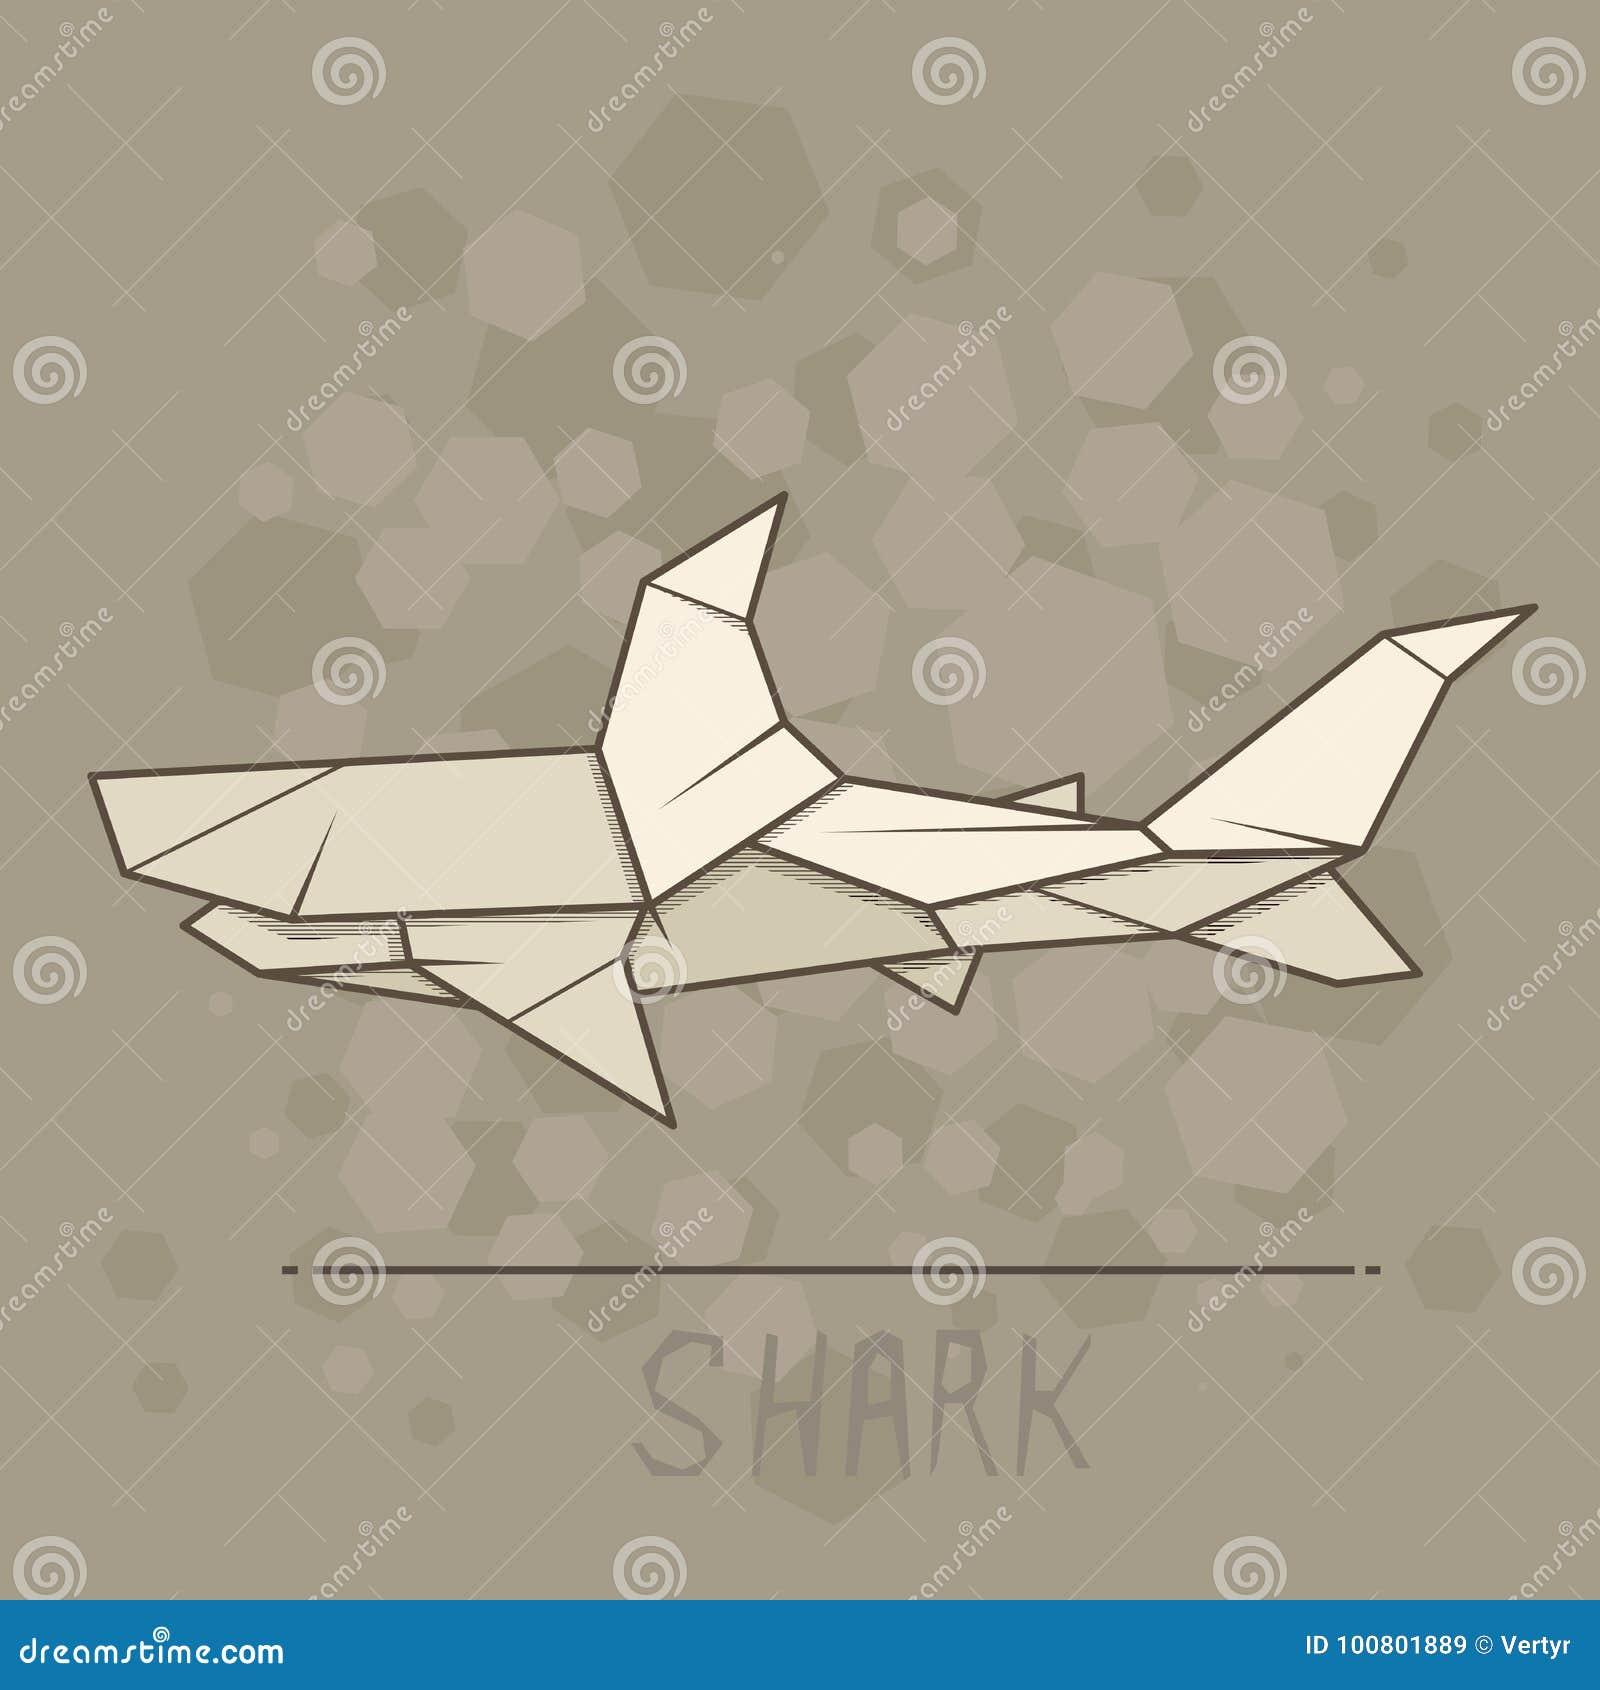 Vector Illustration Paper Origami Of Shark Stock Vector